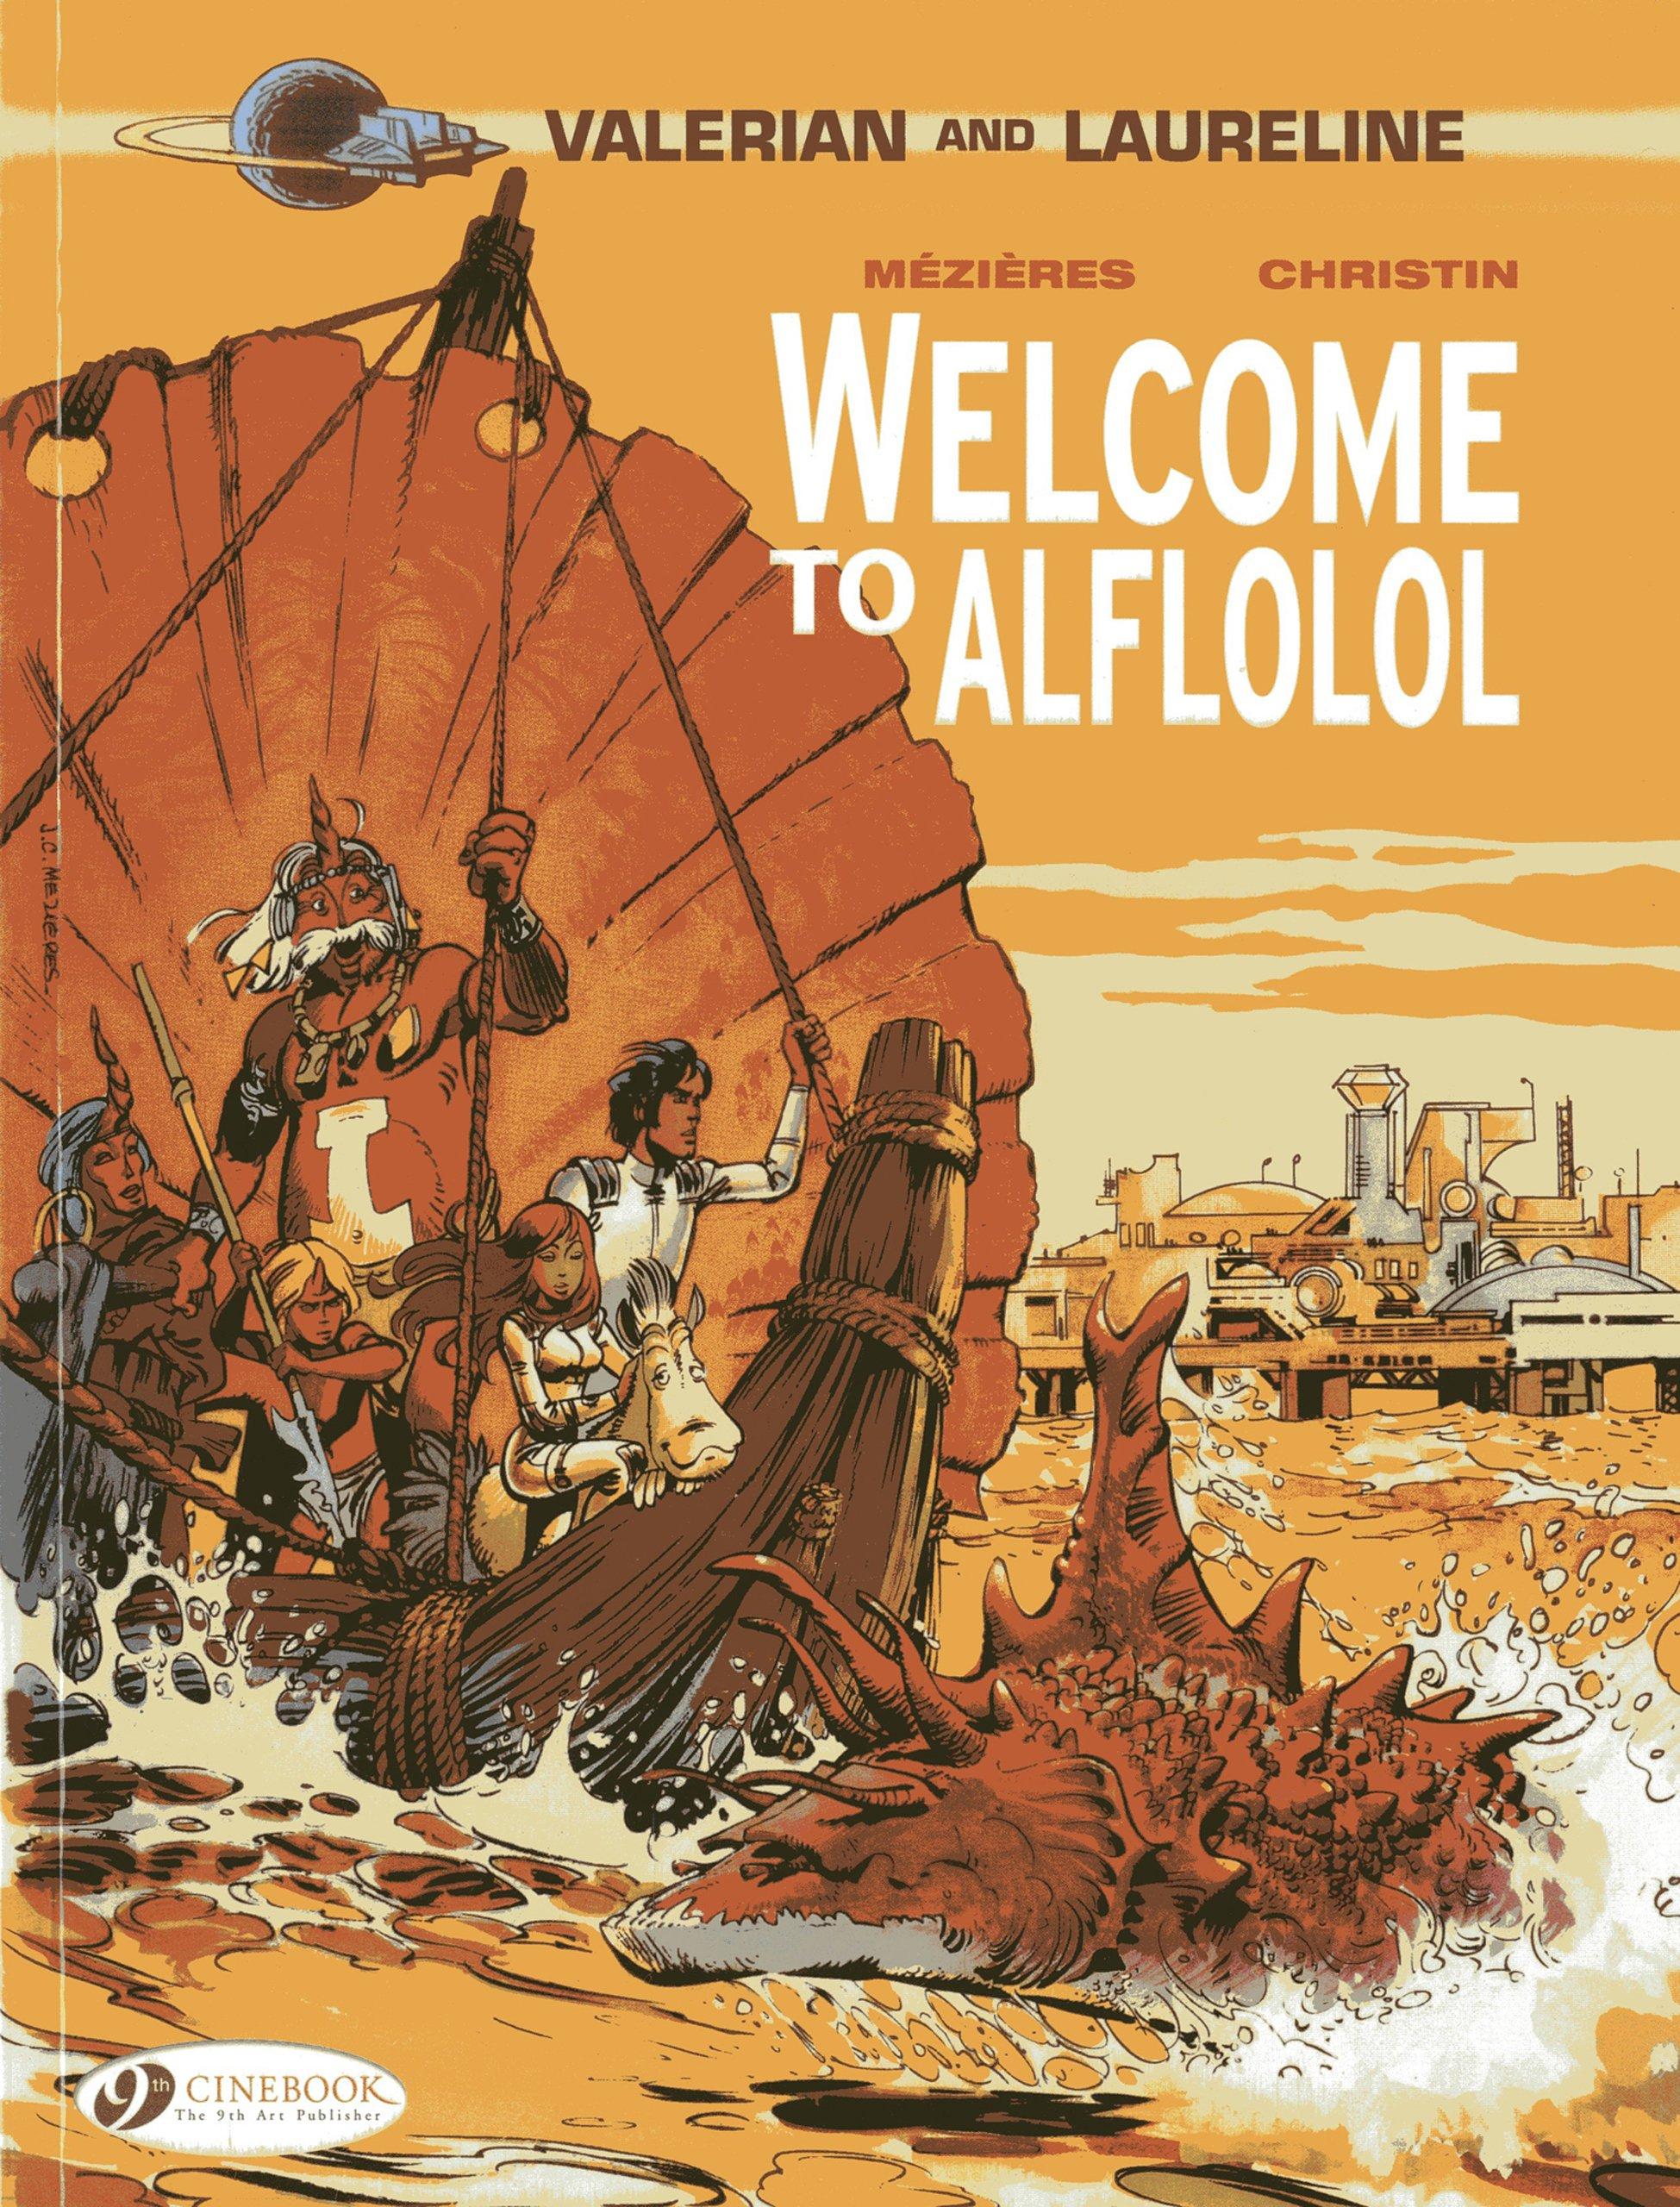 Welcometoalflolol.jpg